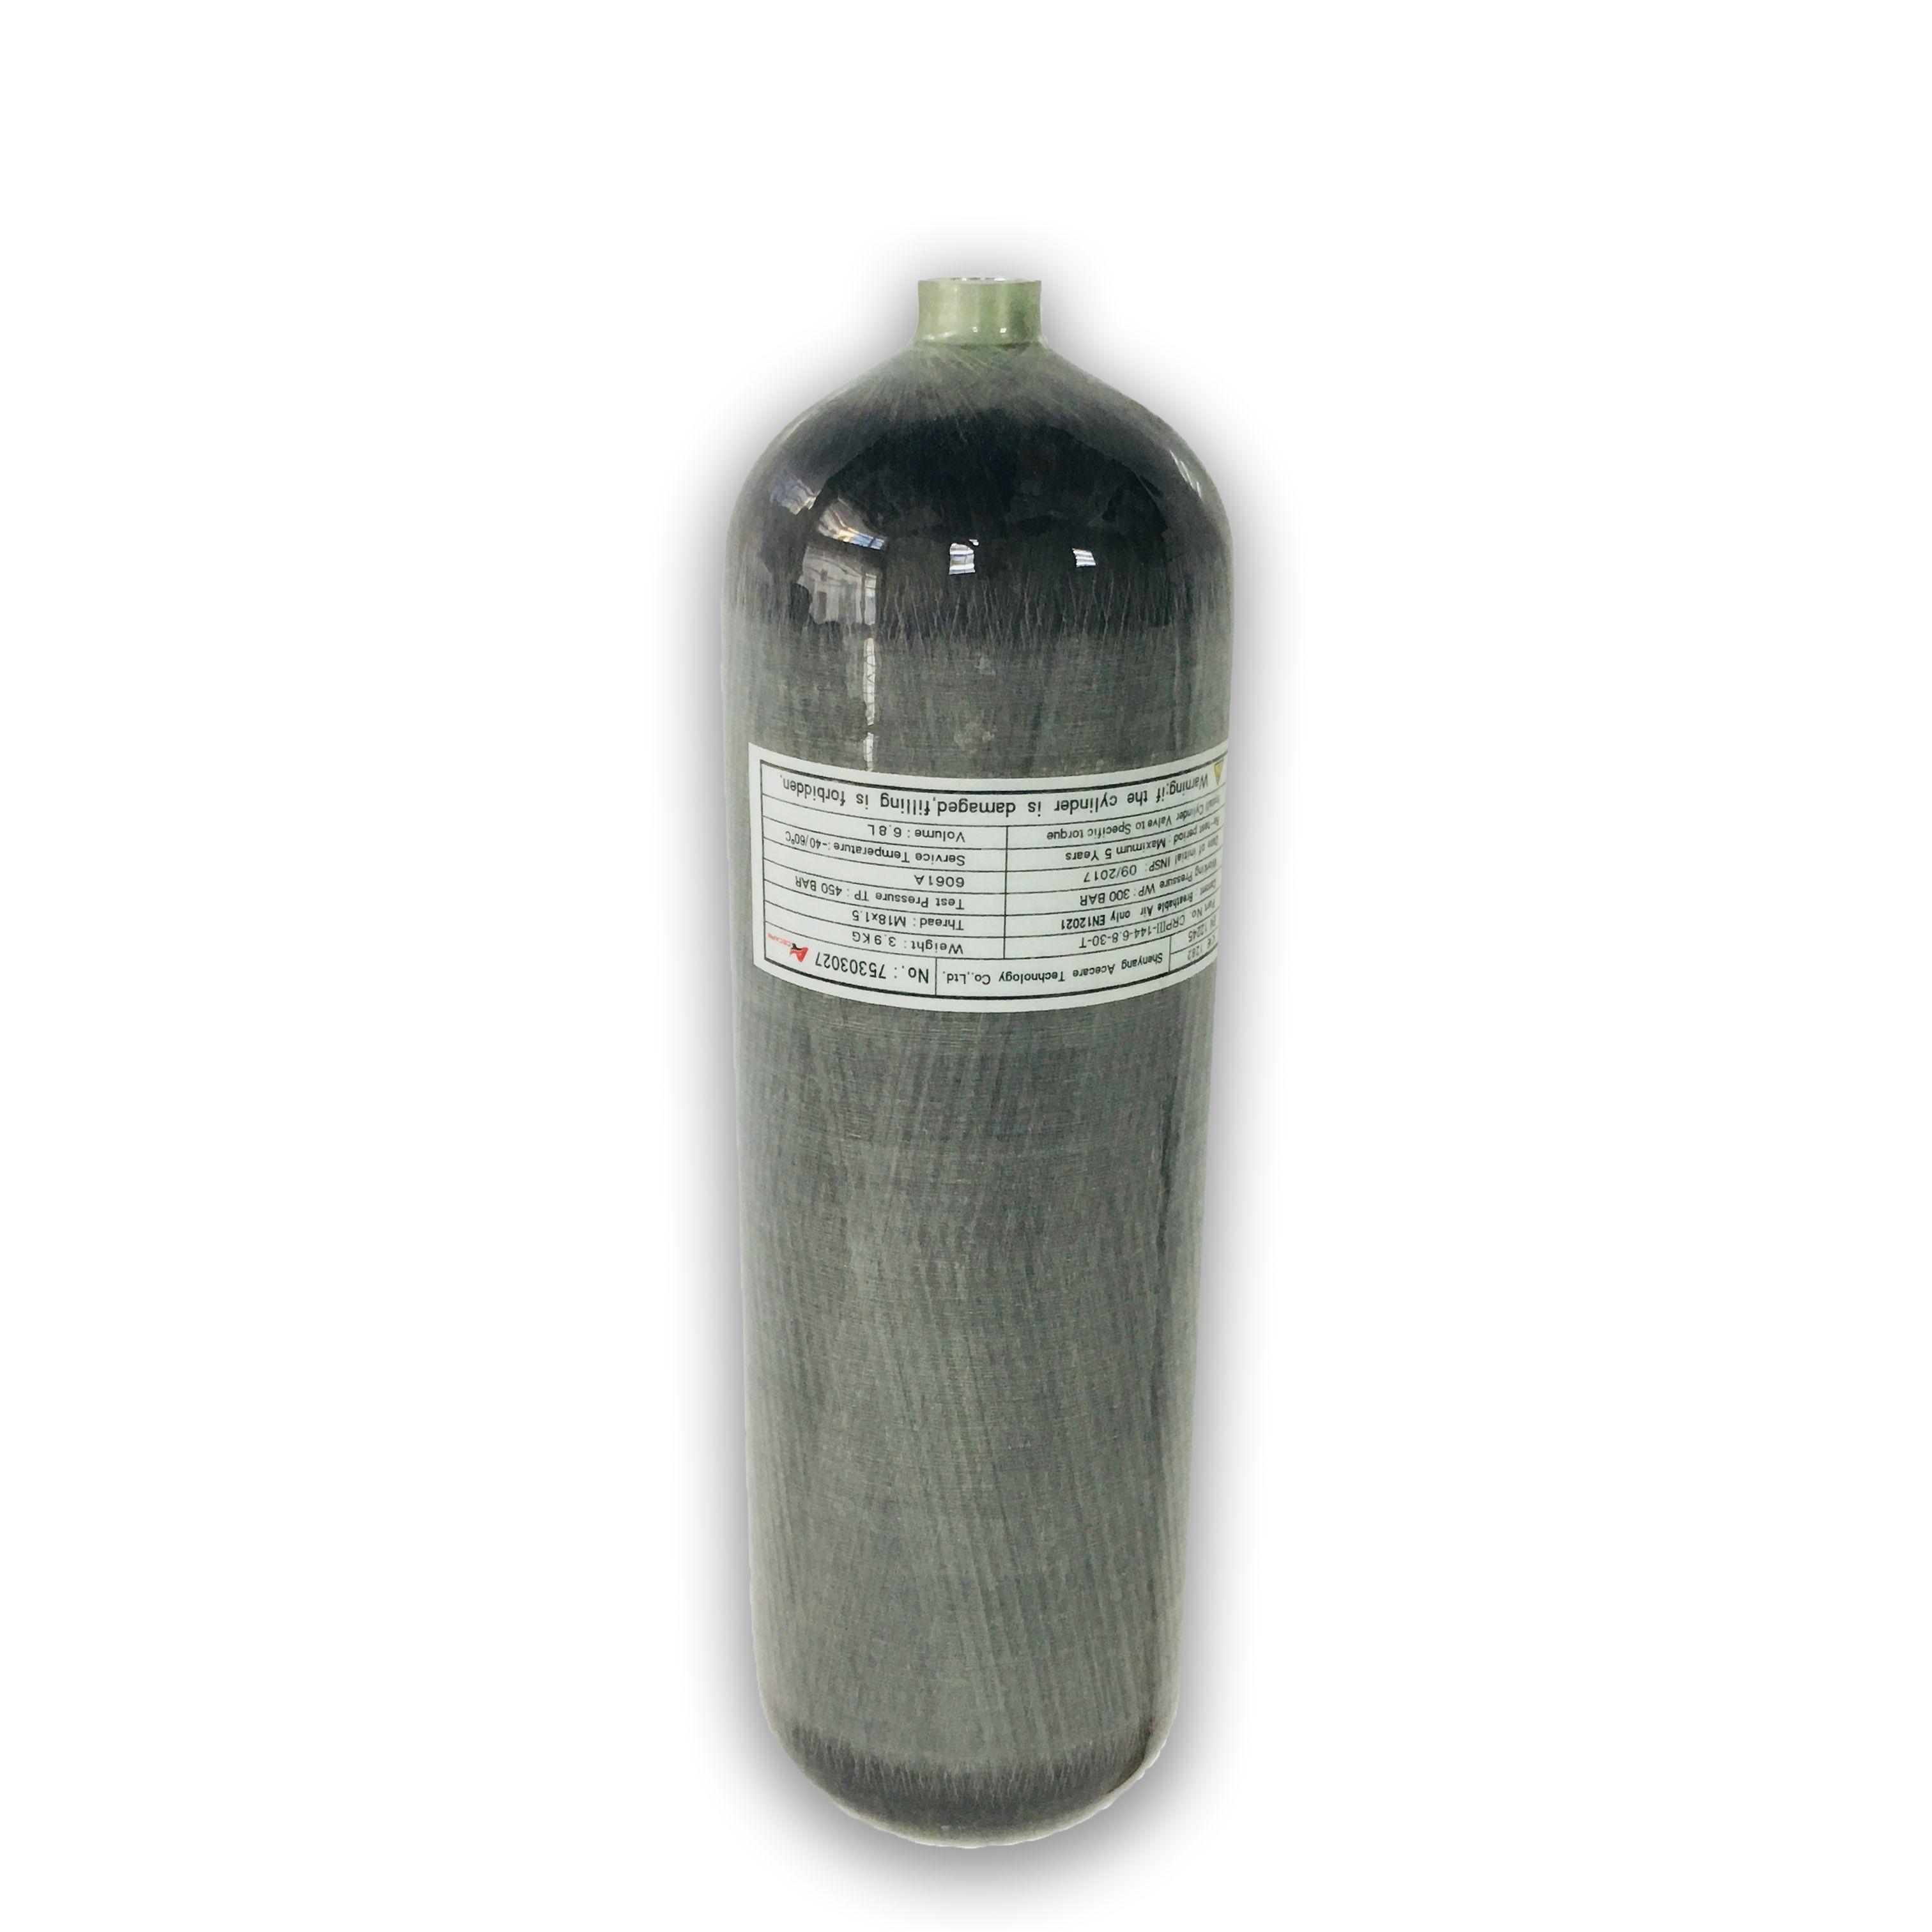 AC168 6.8L CE Scuba Diving/4500psi/Pcp Air/Paintball/Tank Airforce Condor Pcp Air Rifle Airgun Gas/Oxygen Cylinder Acecare